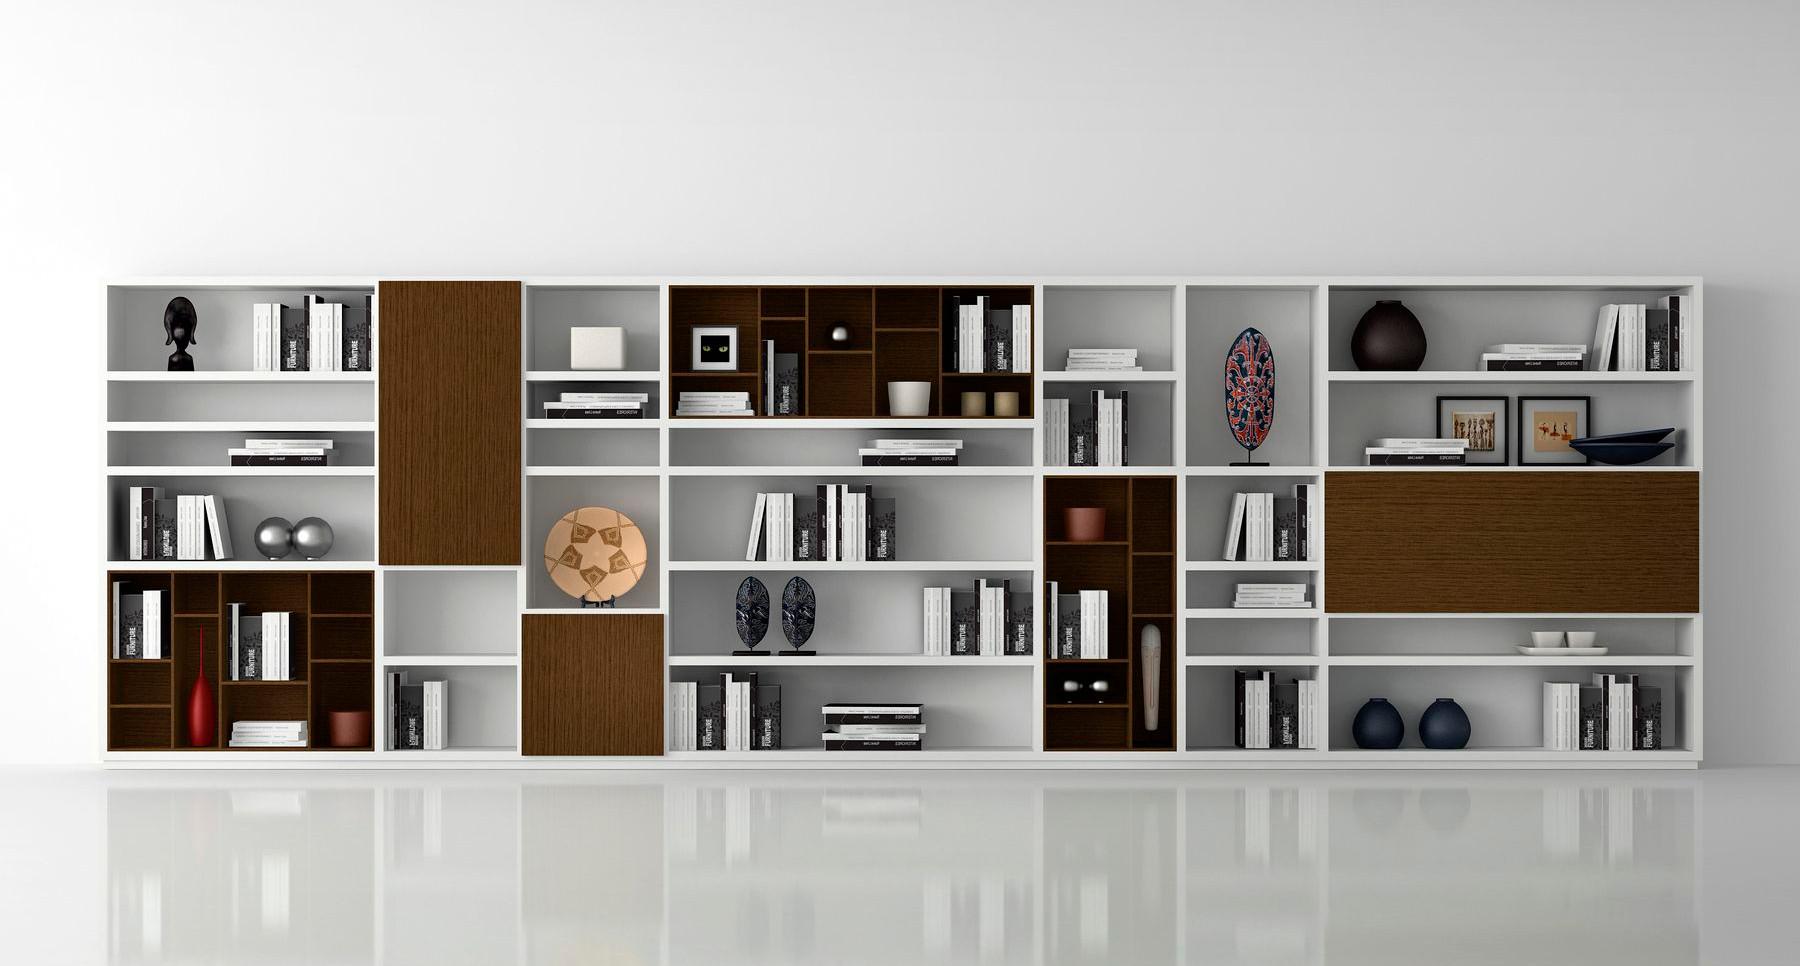 Librerias a medida madrid free muebles a medida mueble for Mueble libreria a medida